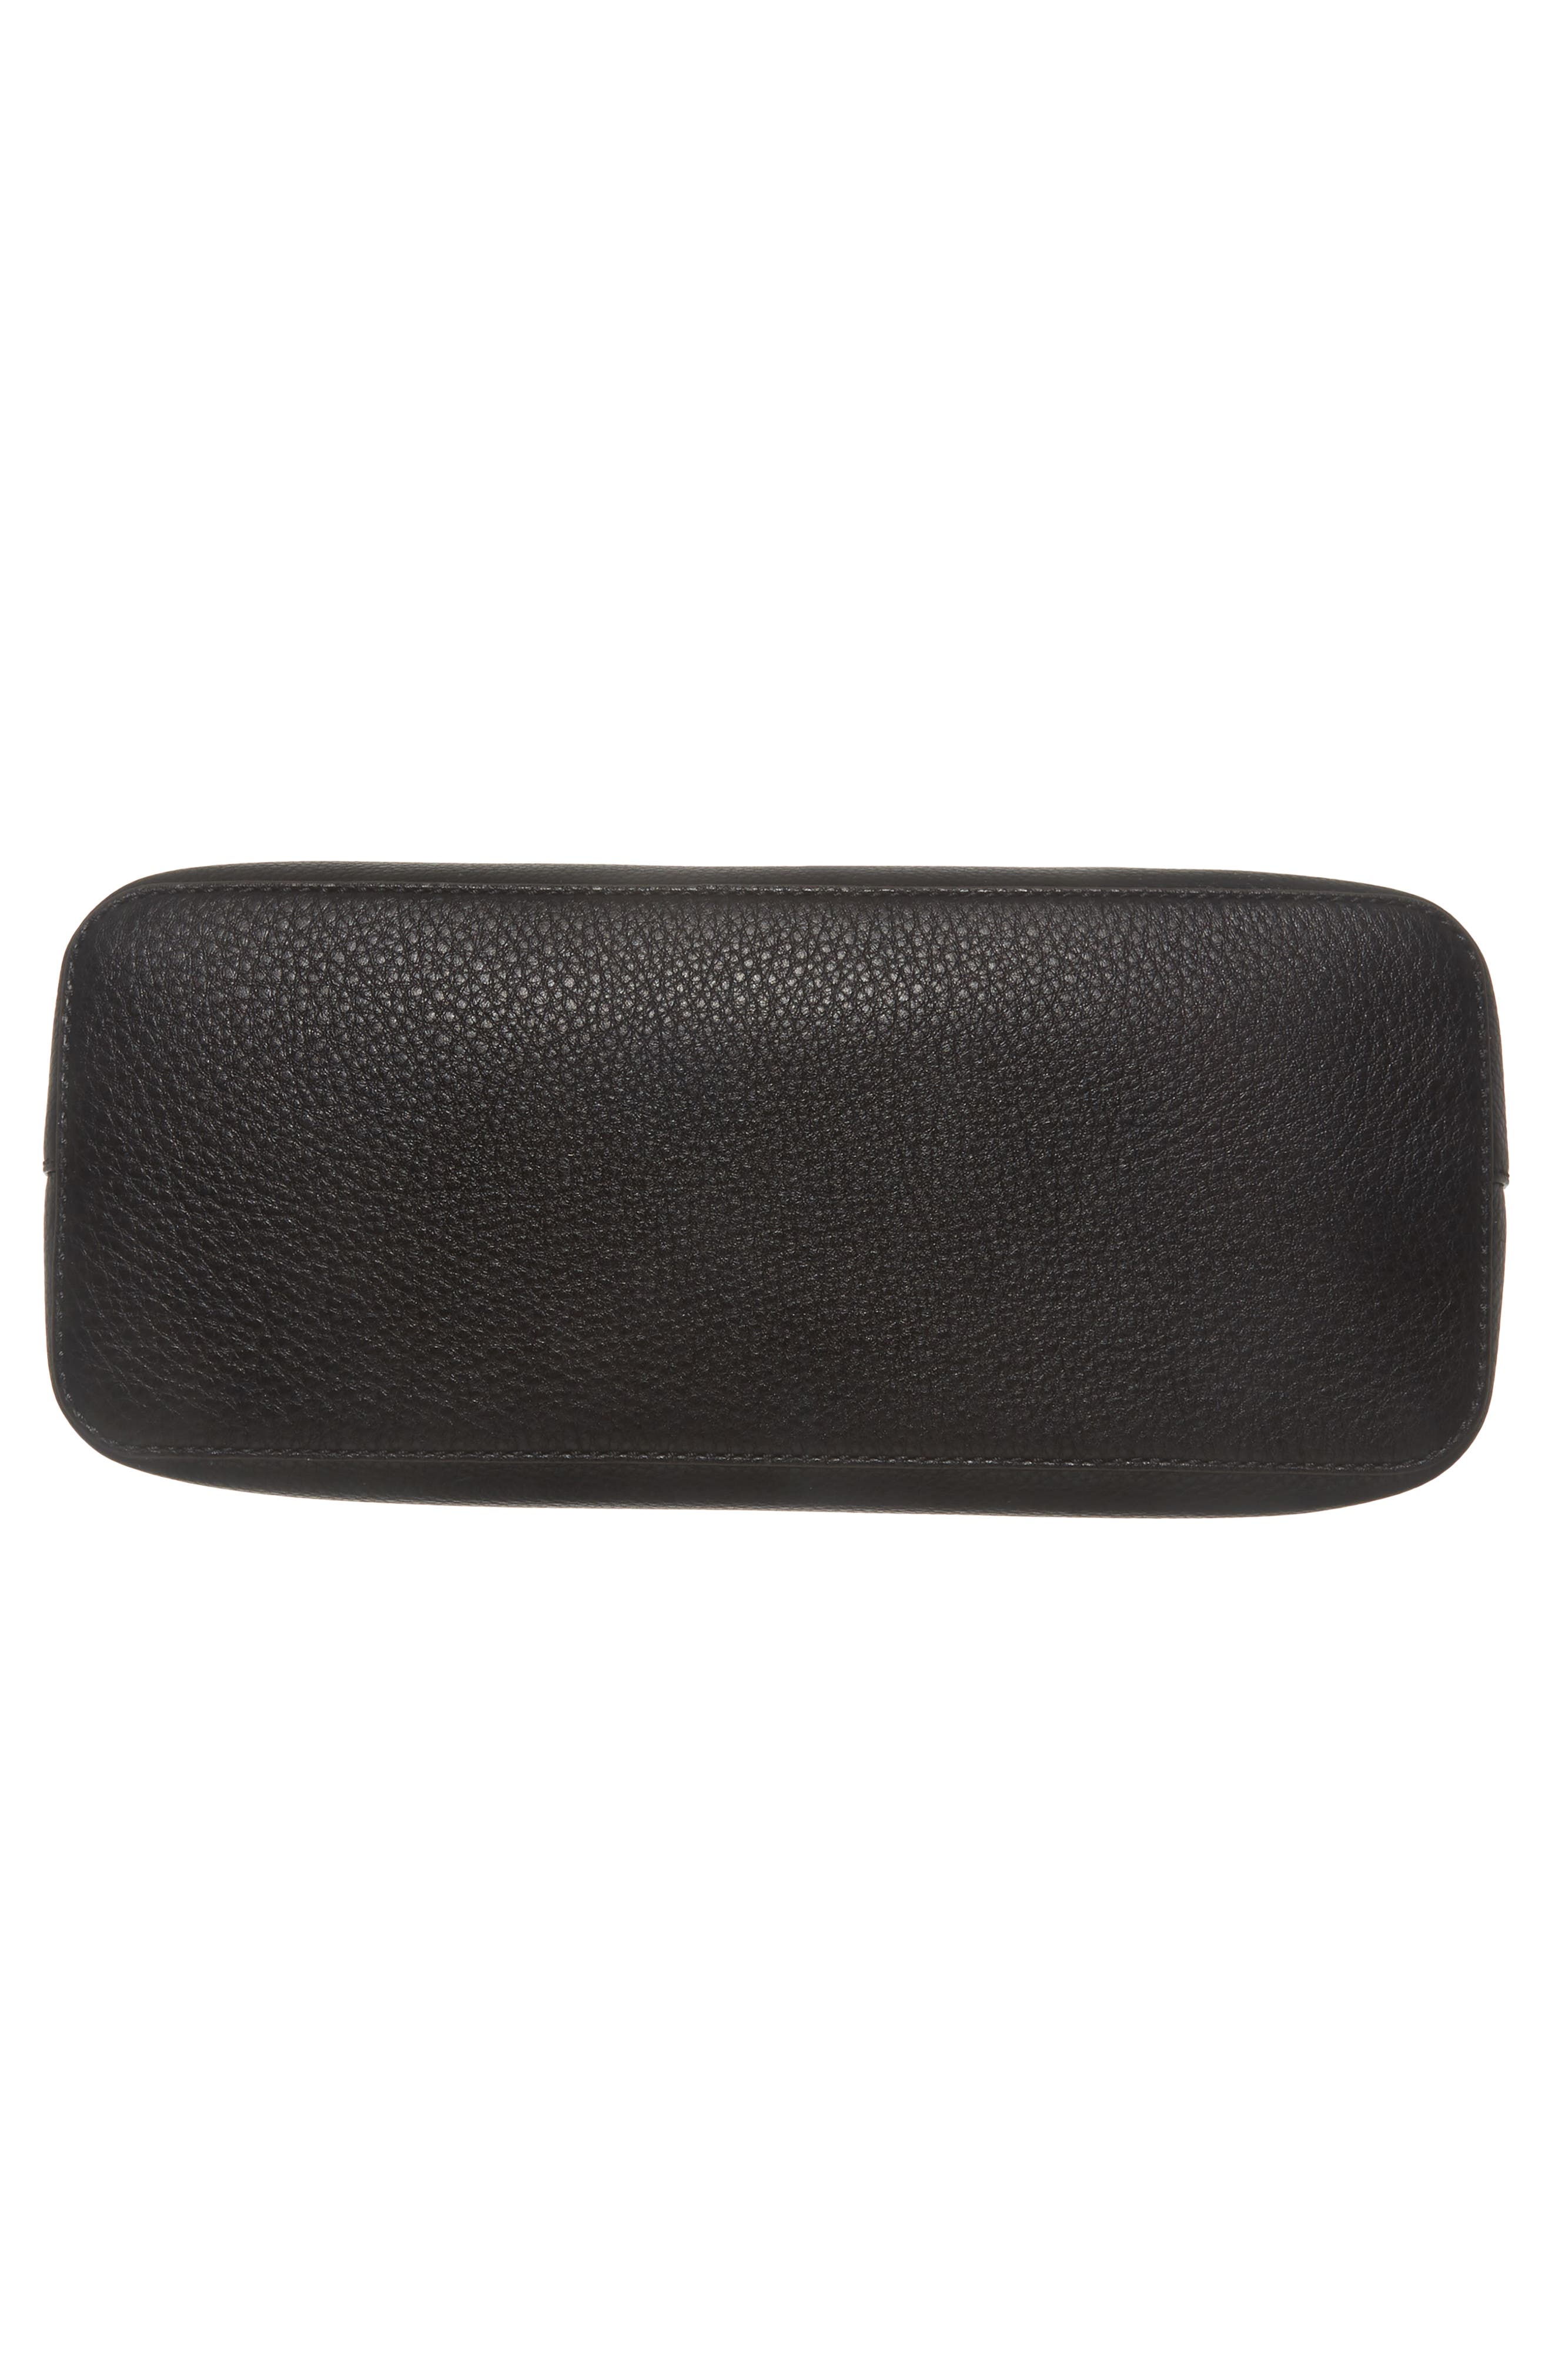 McGraw Slouchy Leather Satchel,                             Alternate thumbnail 6, color,                             BLACK